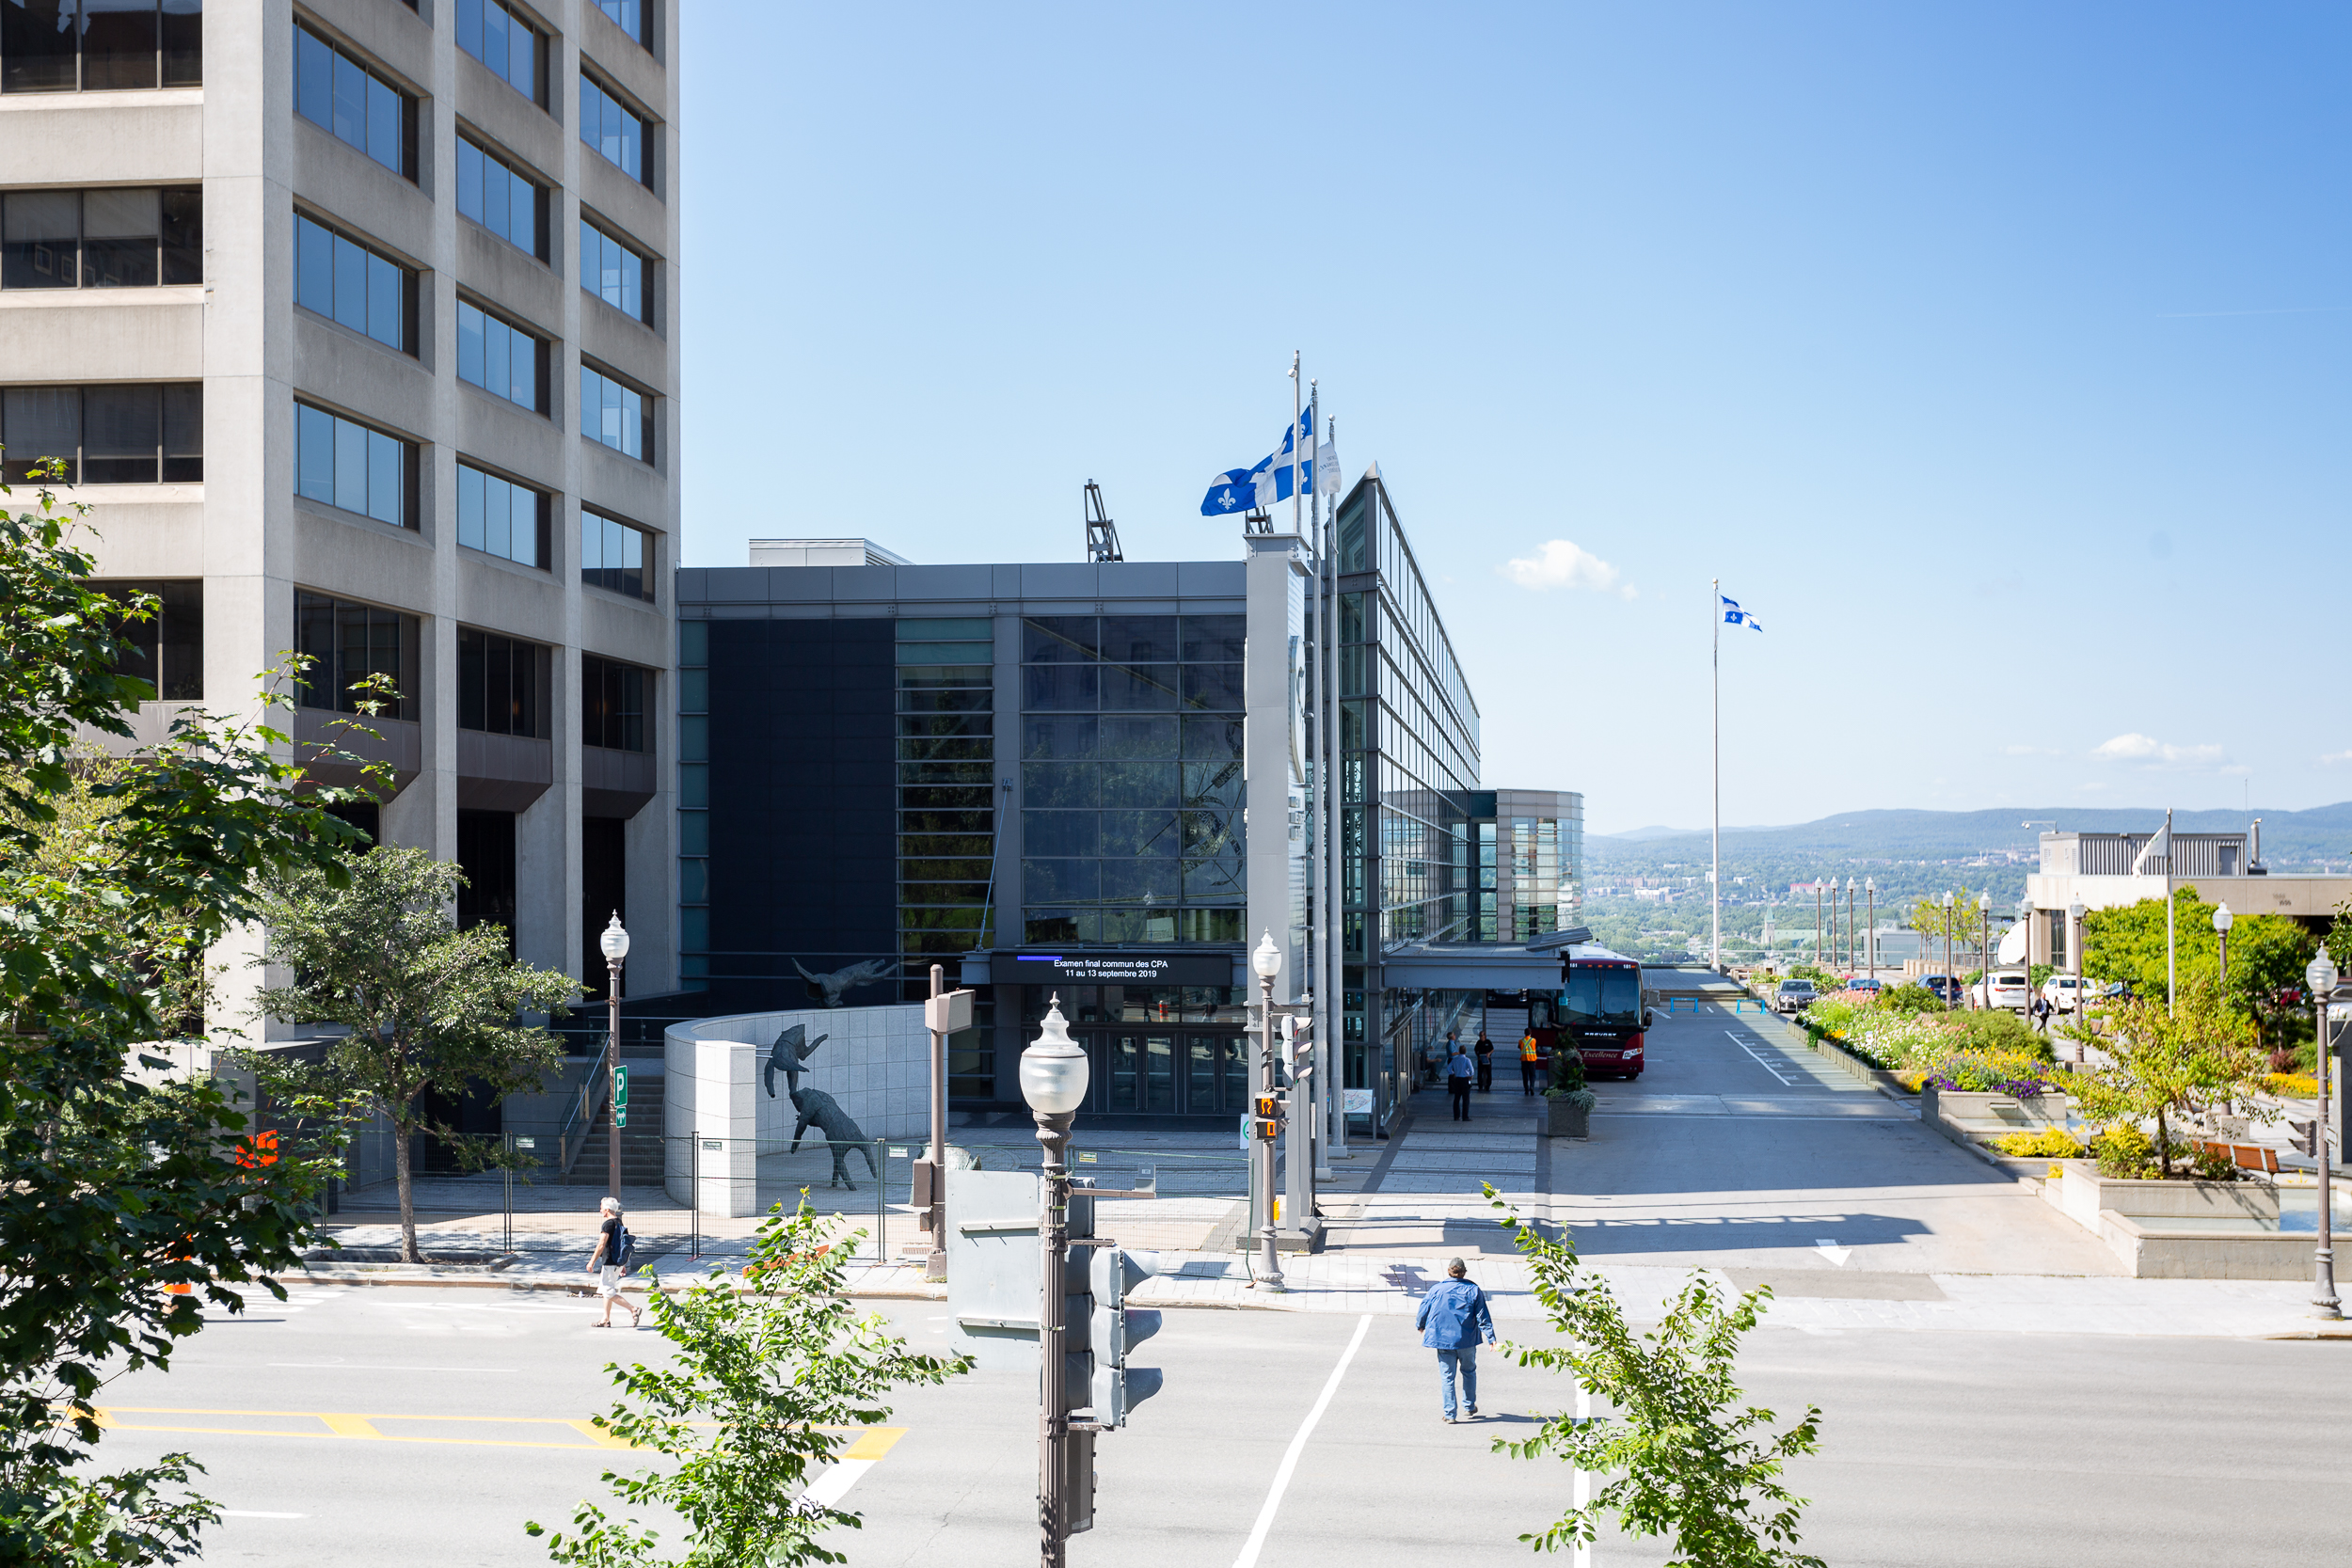 Quebec_QuebecCityConventionCenter_6155148_03_.jpg